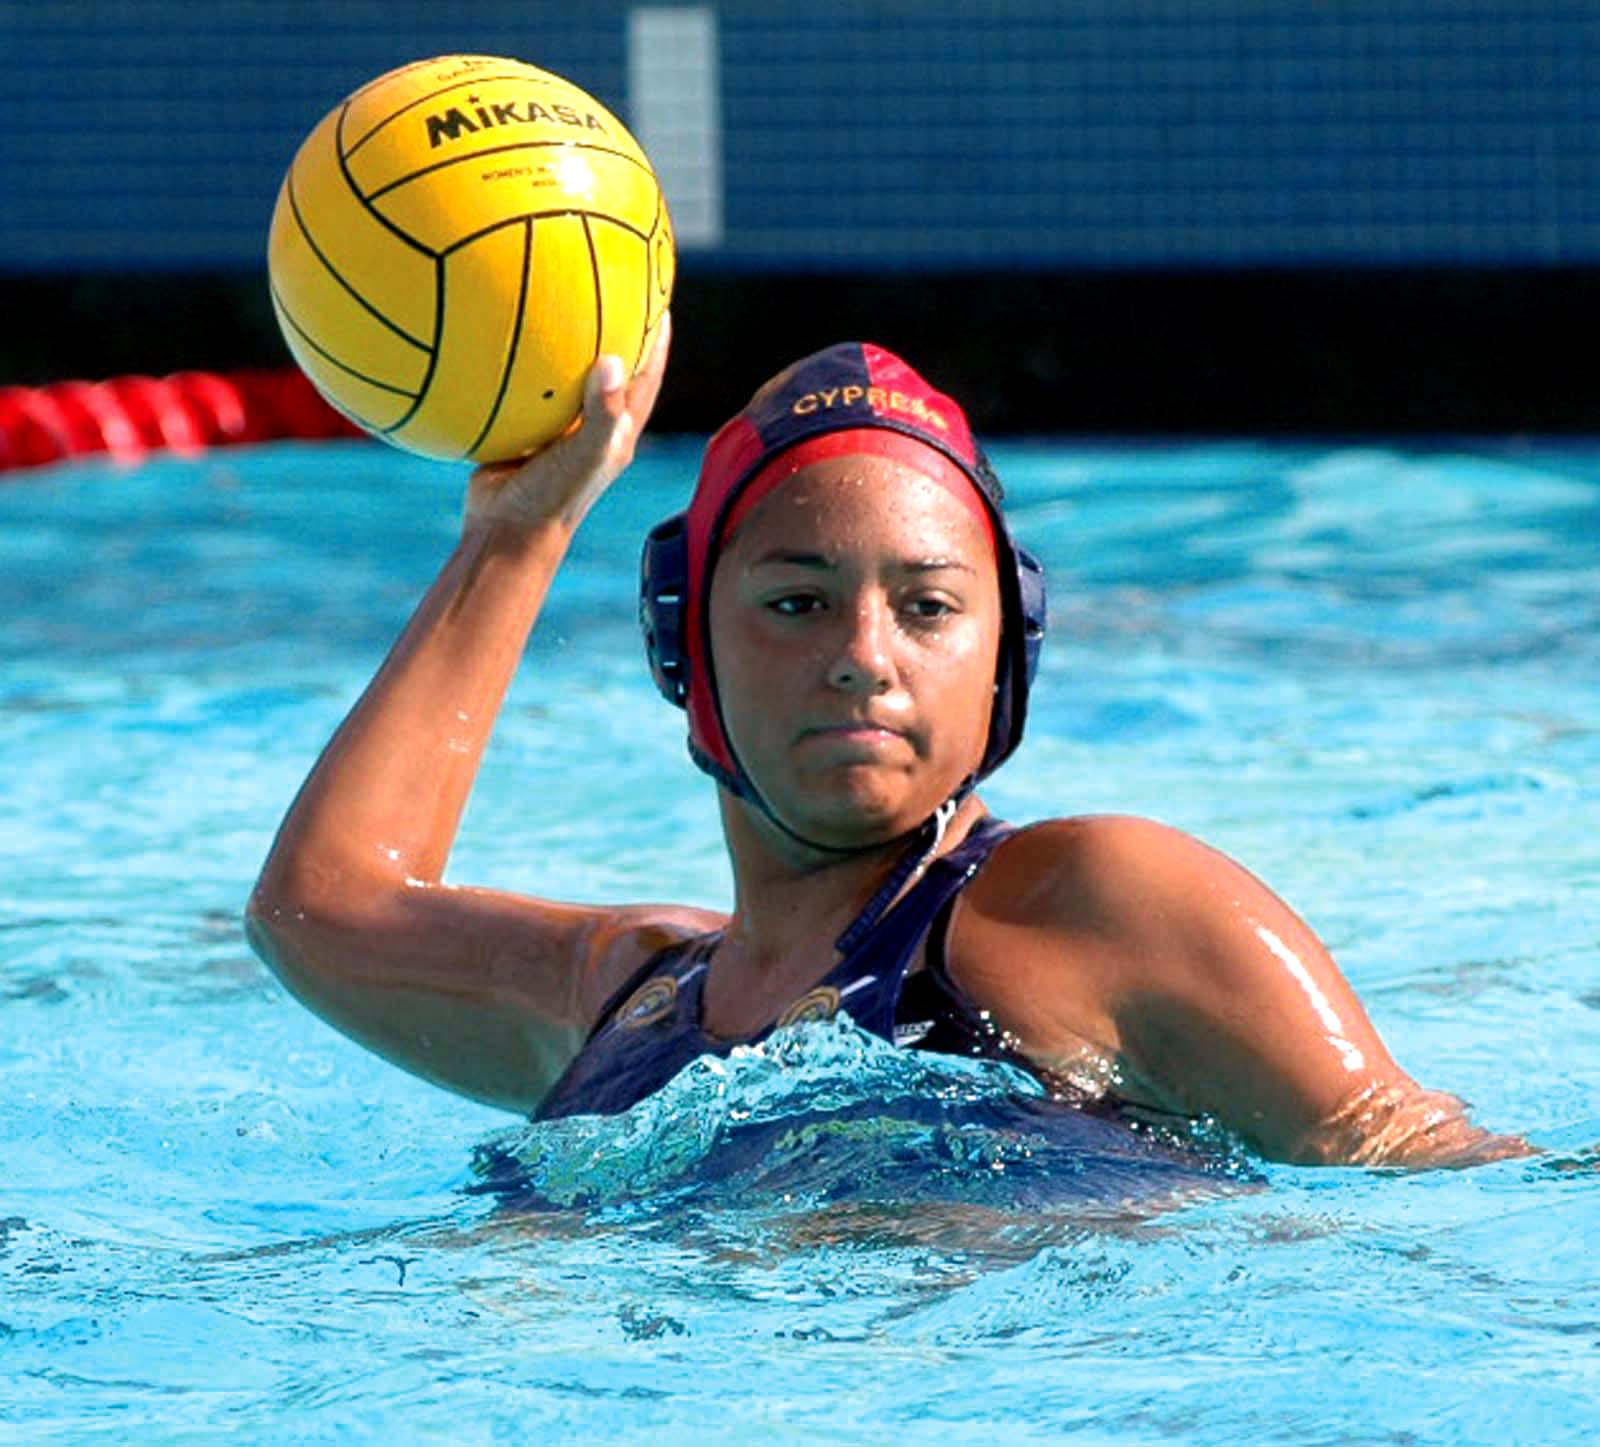 Women's water polo by arivera626